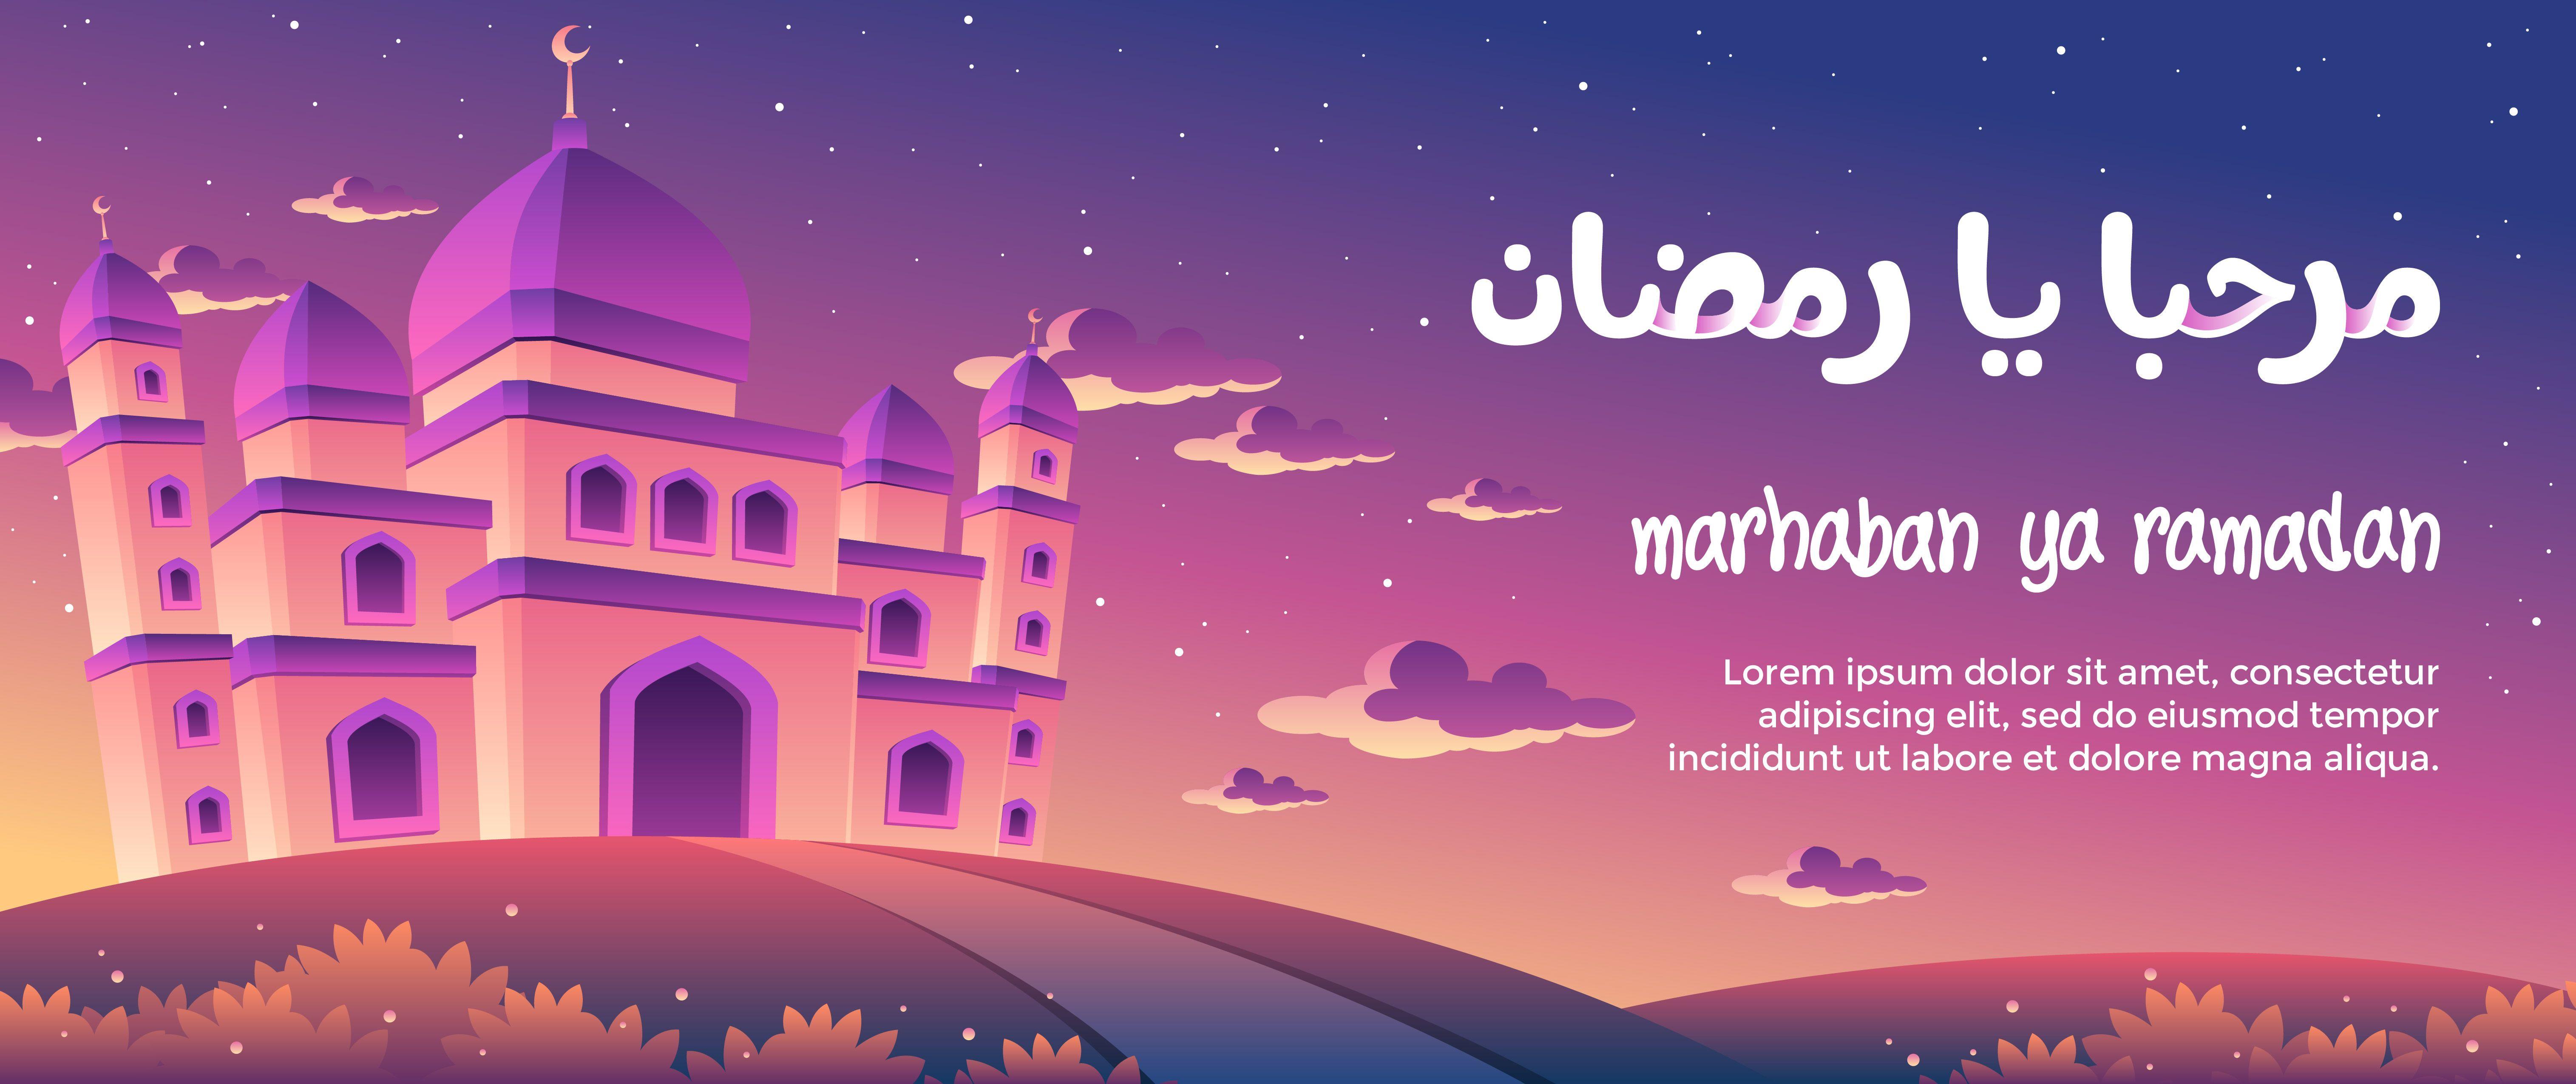 Marhaban Ya Ramadan With A Magnificent Mosque At Dusk Greeting Card Spanduk Gambar